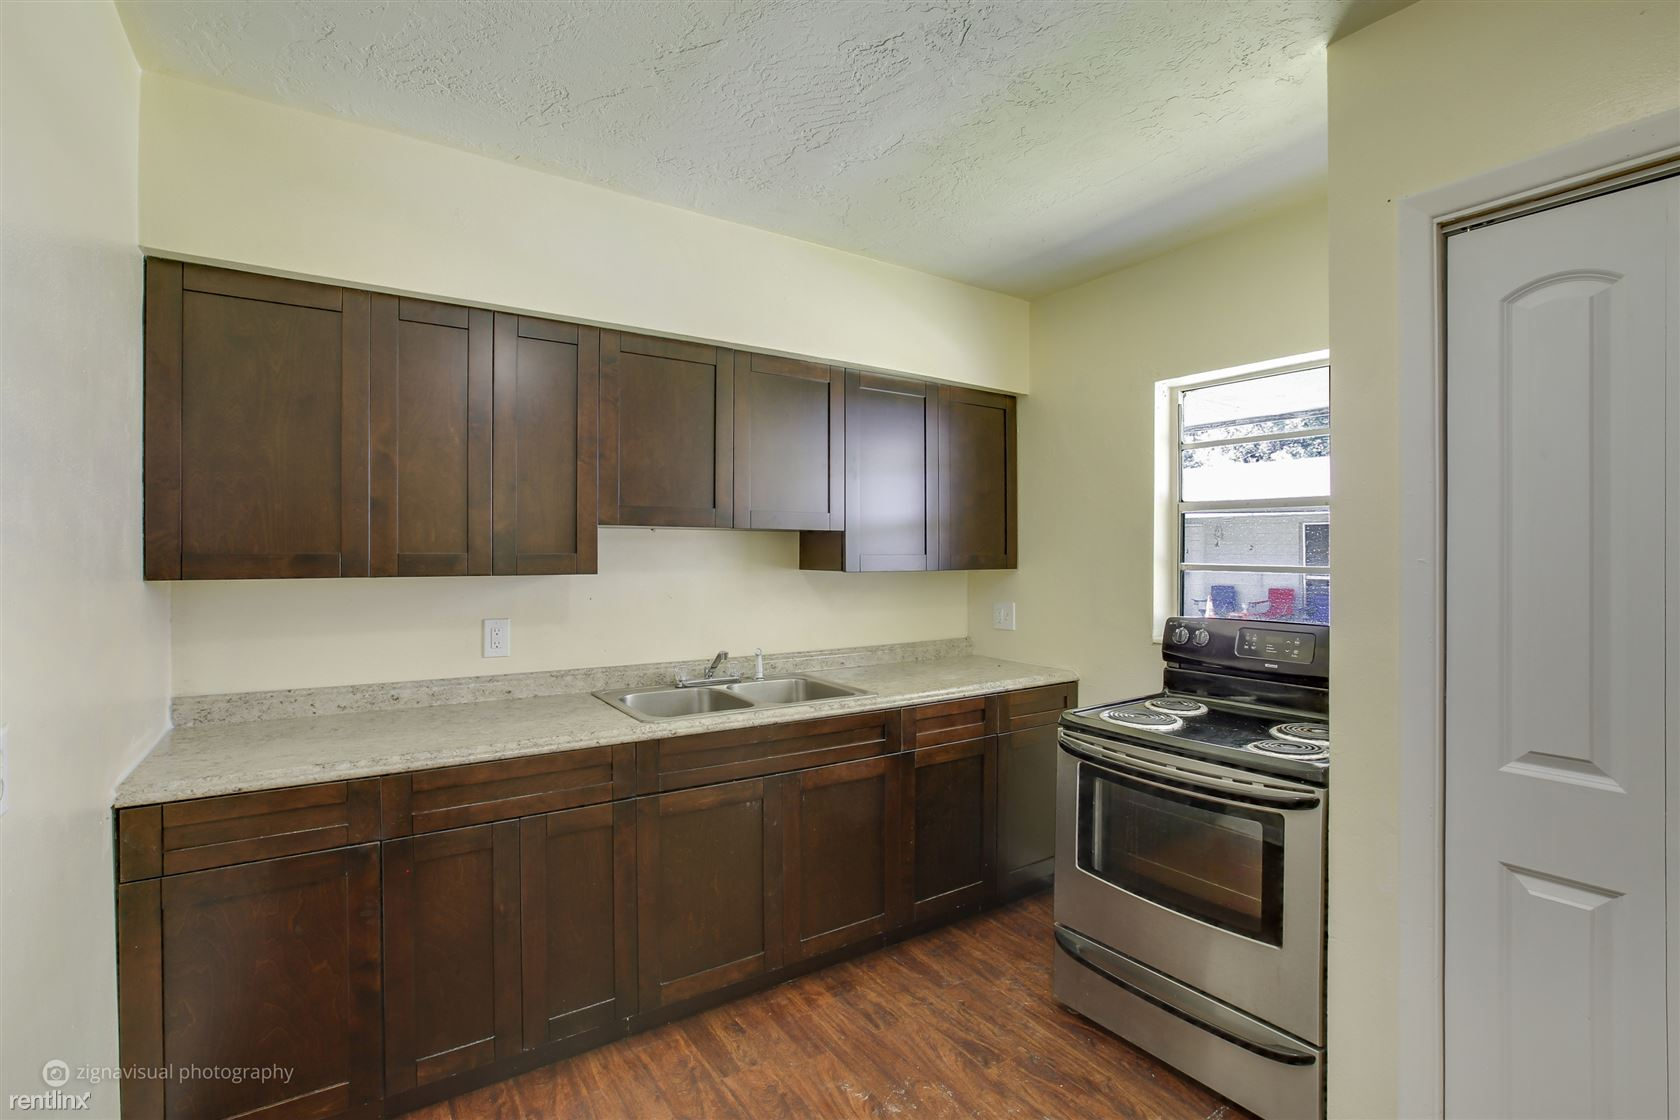 740 NE 5th Ave Apt 10, Crystal River, FL - $800